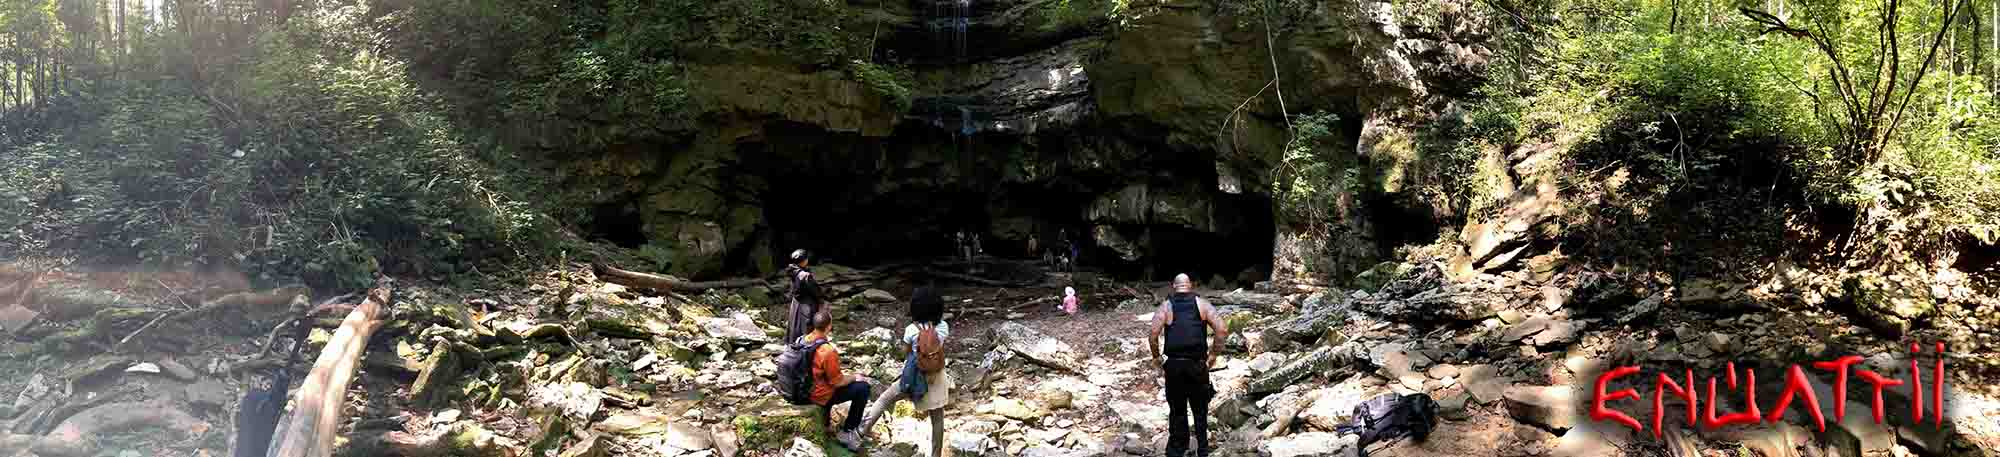 enuattii-group-waterfall-pano